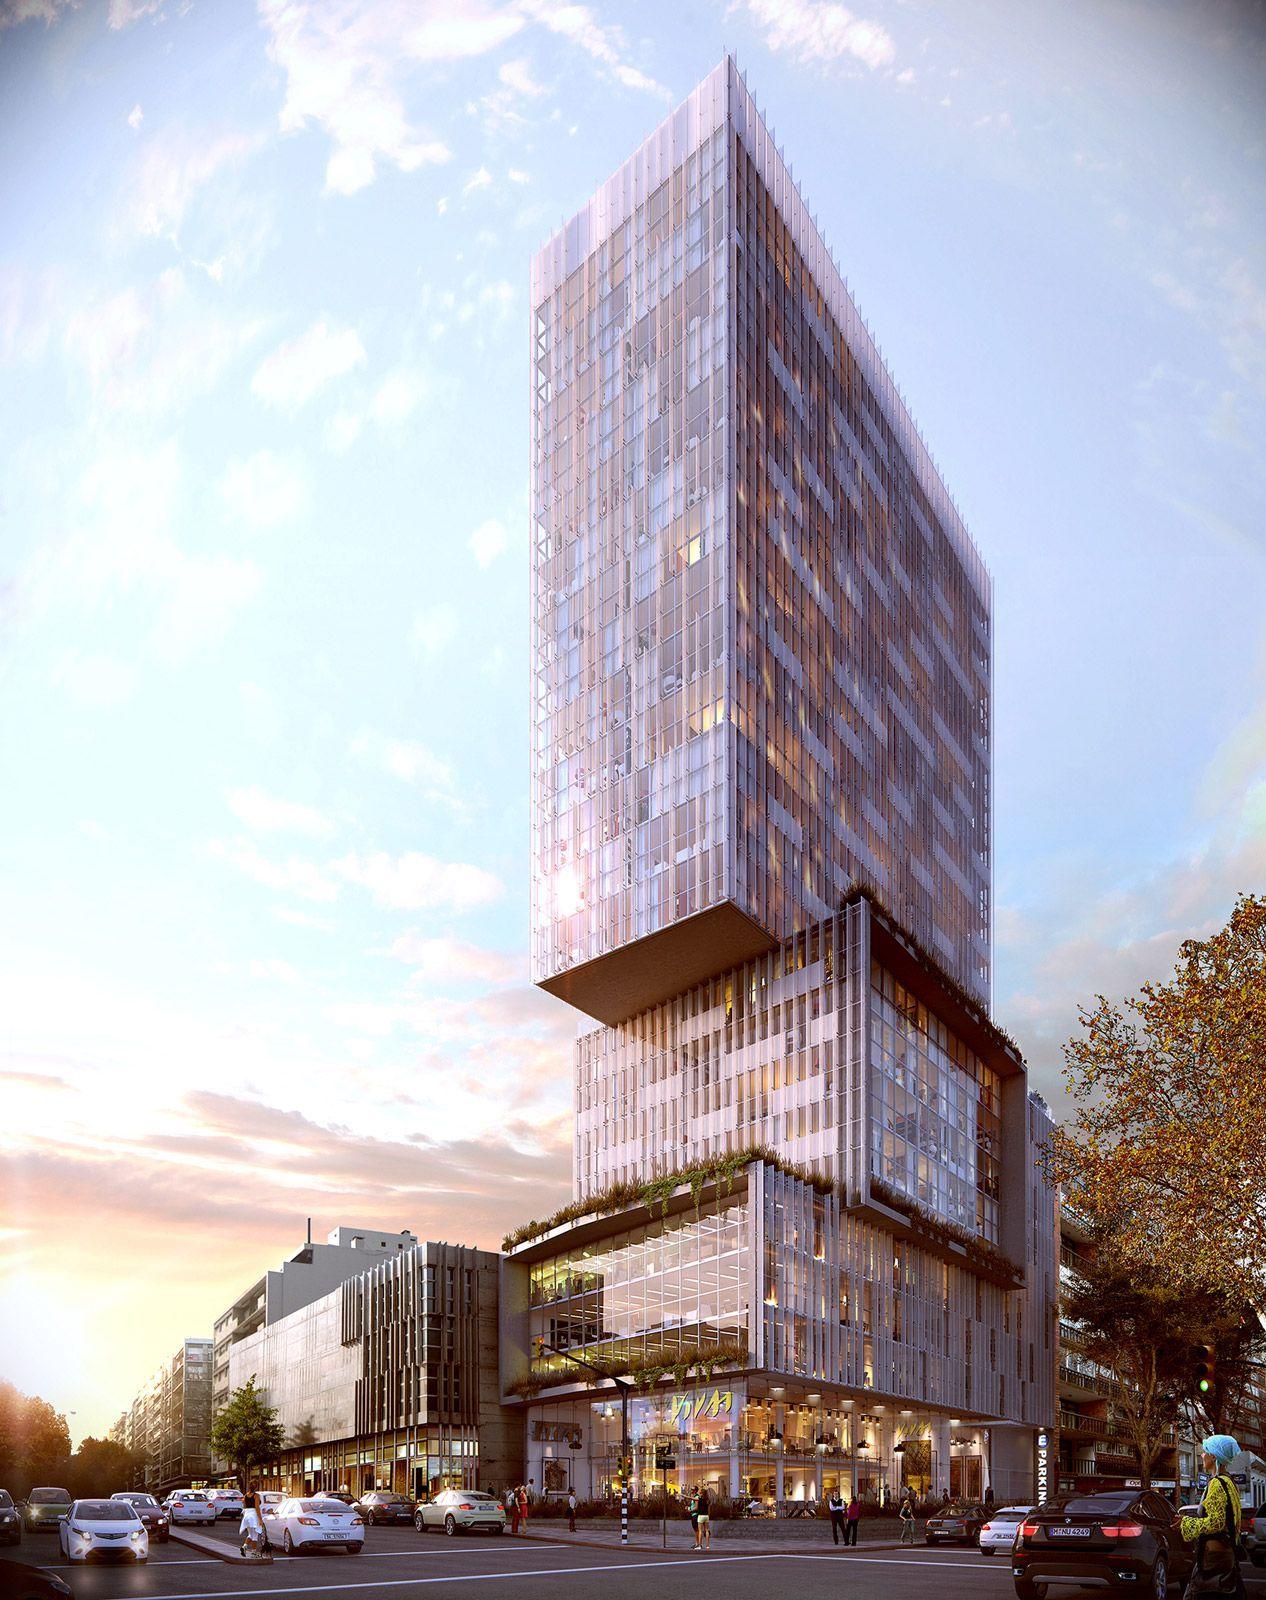 VrayWorld - Brasil Tower Design | #MichaelLouis - www.MichaelLouis.com